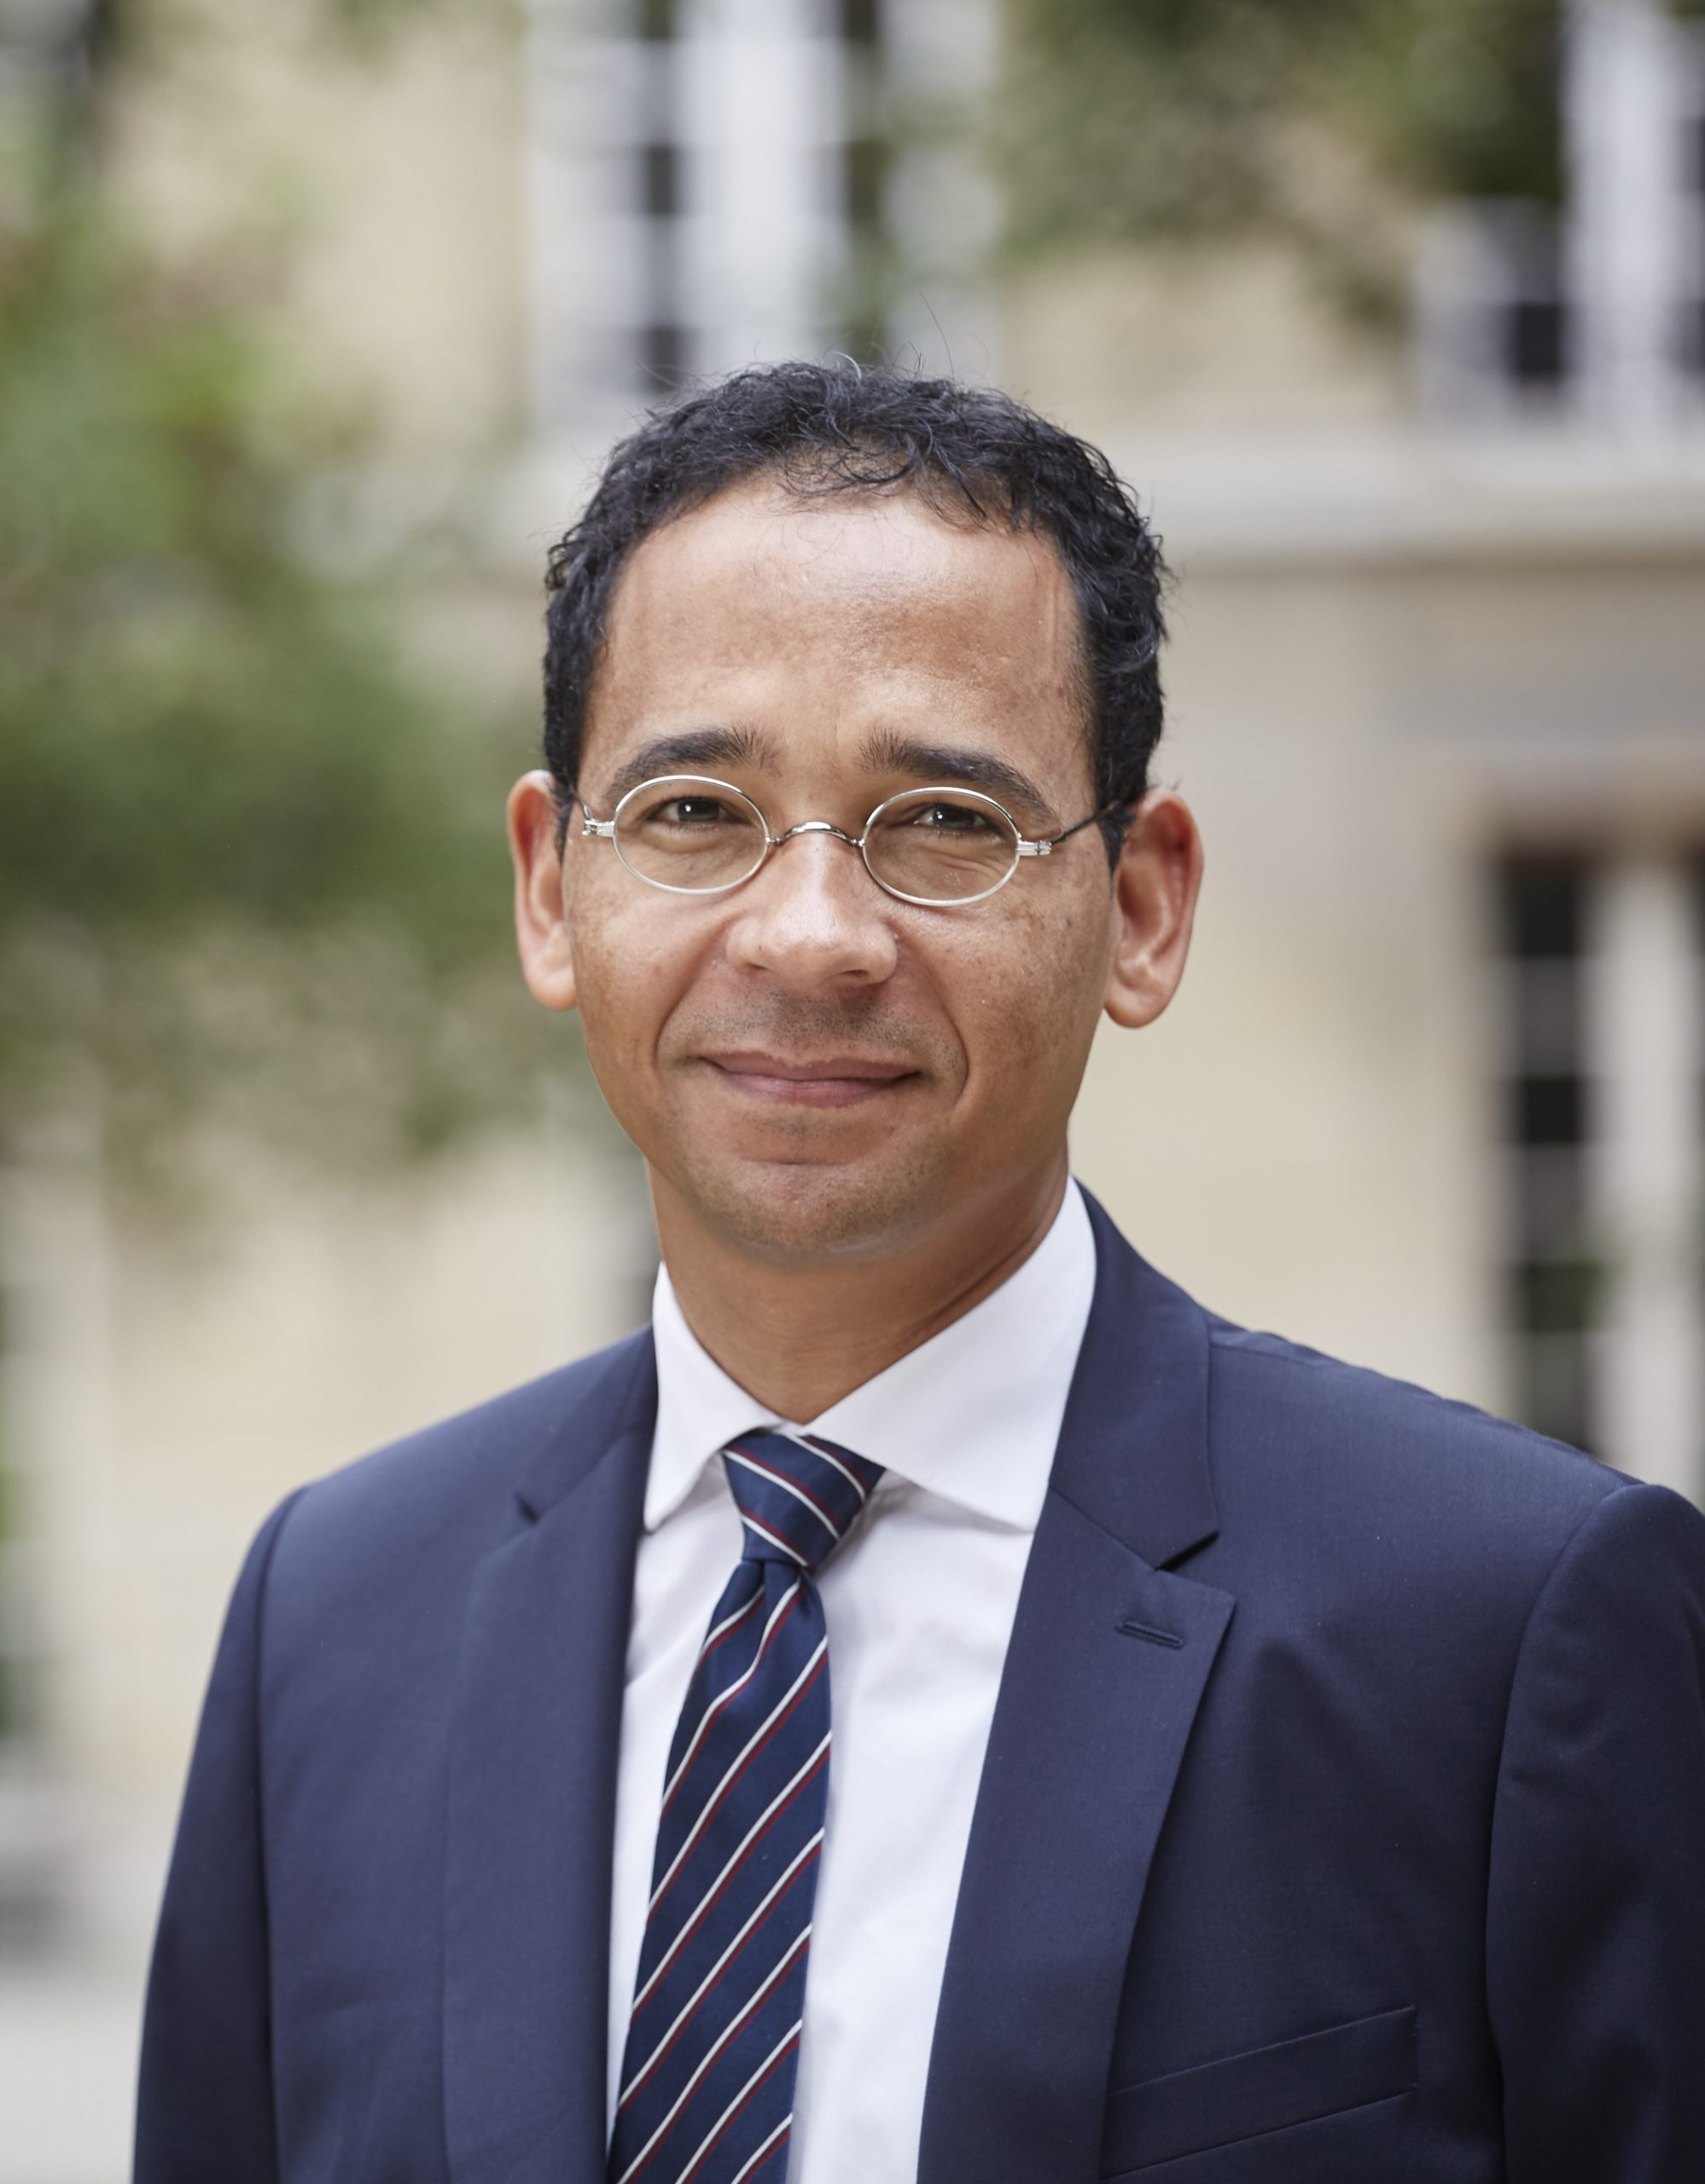 Thierry Balzacq